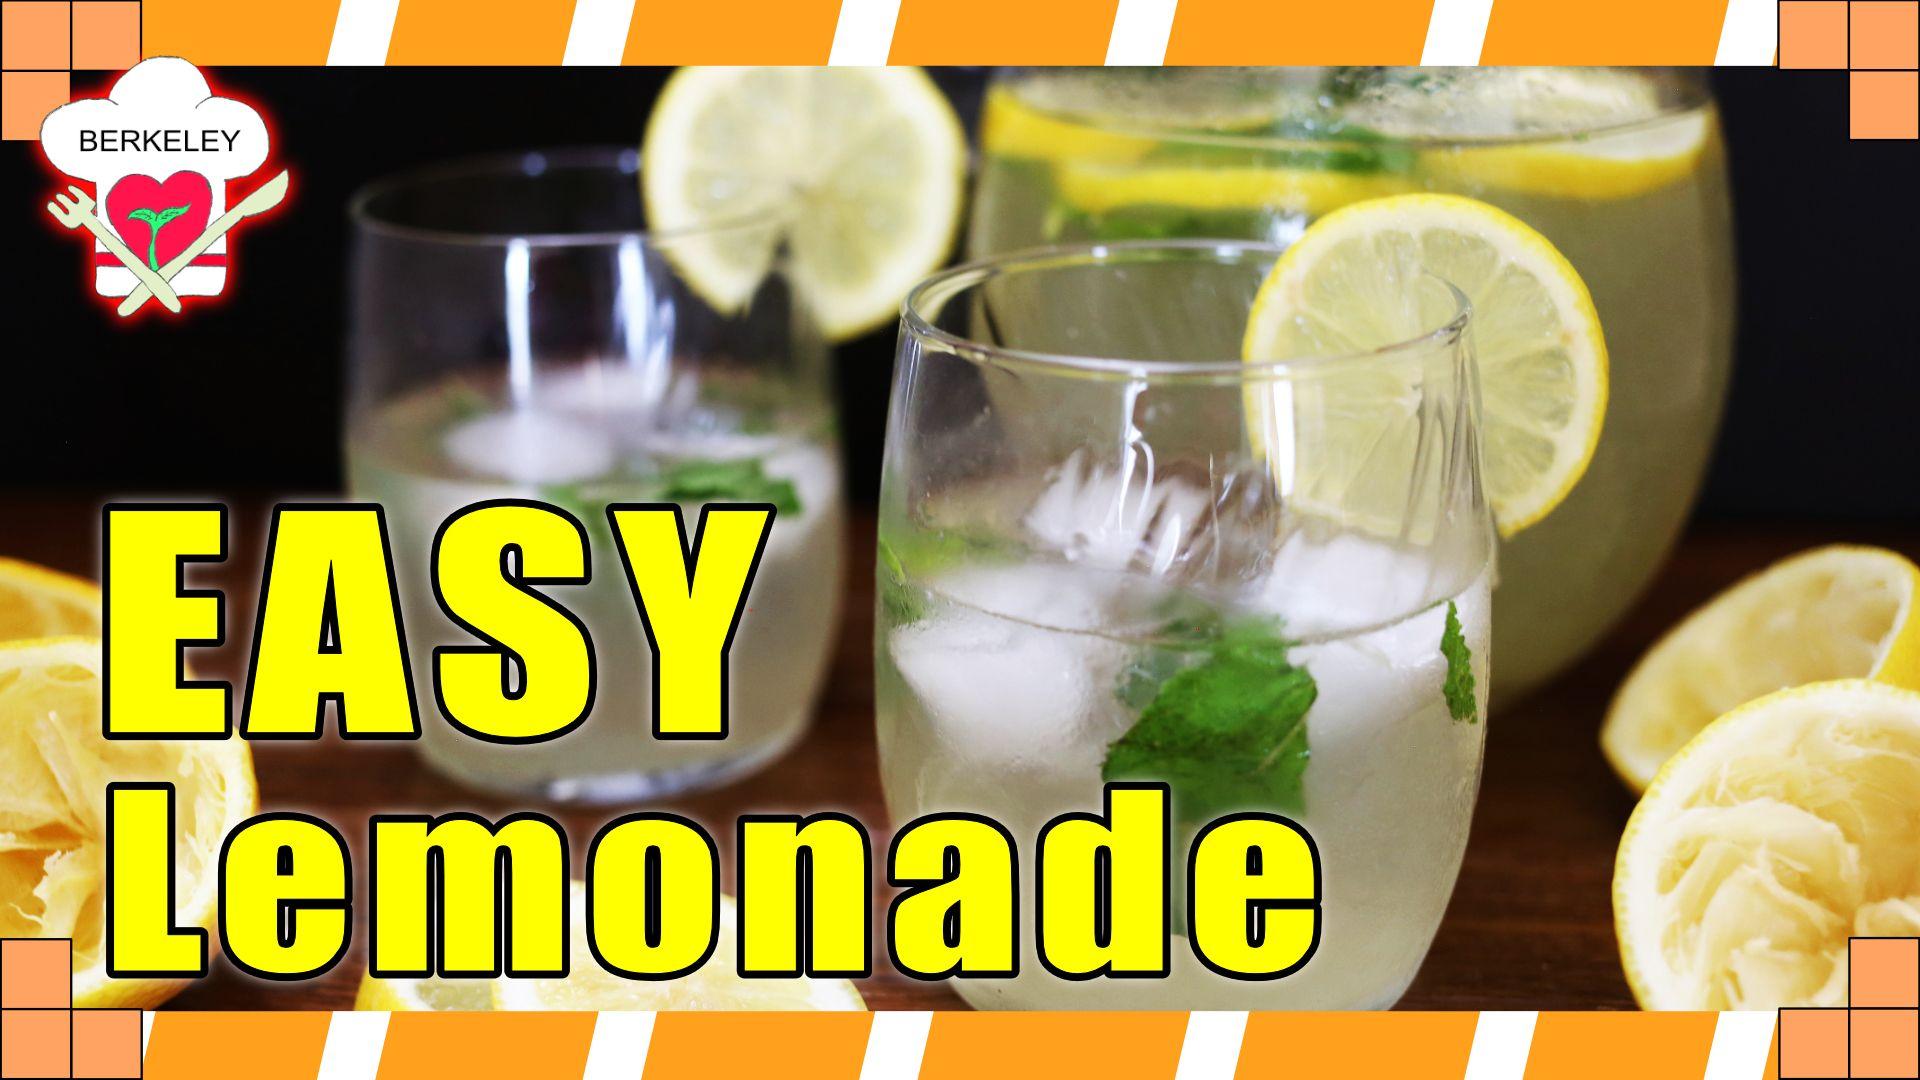 homemade lemonade, lemonade recipe